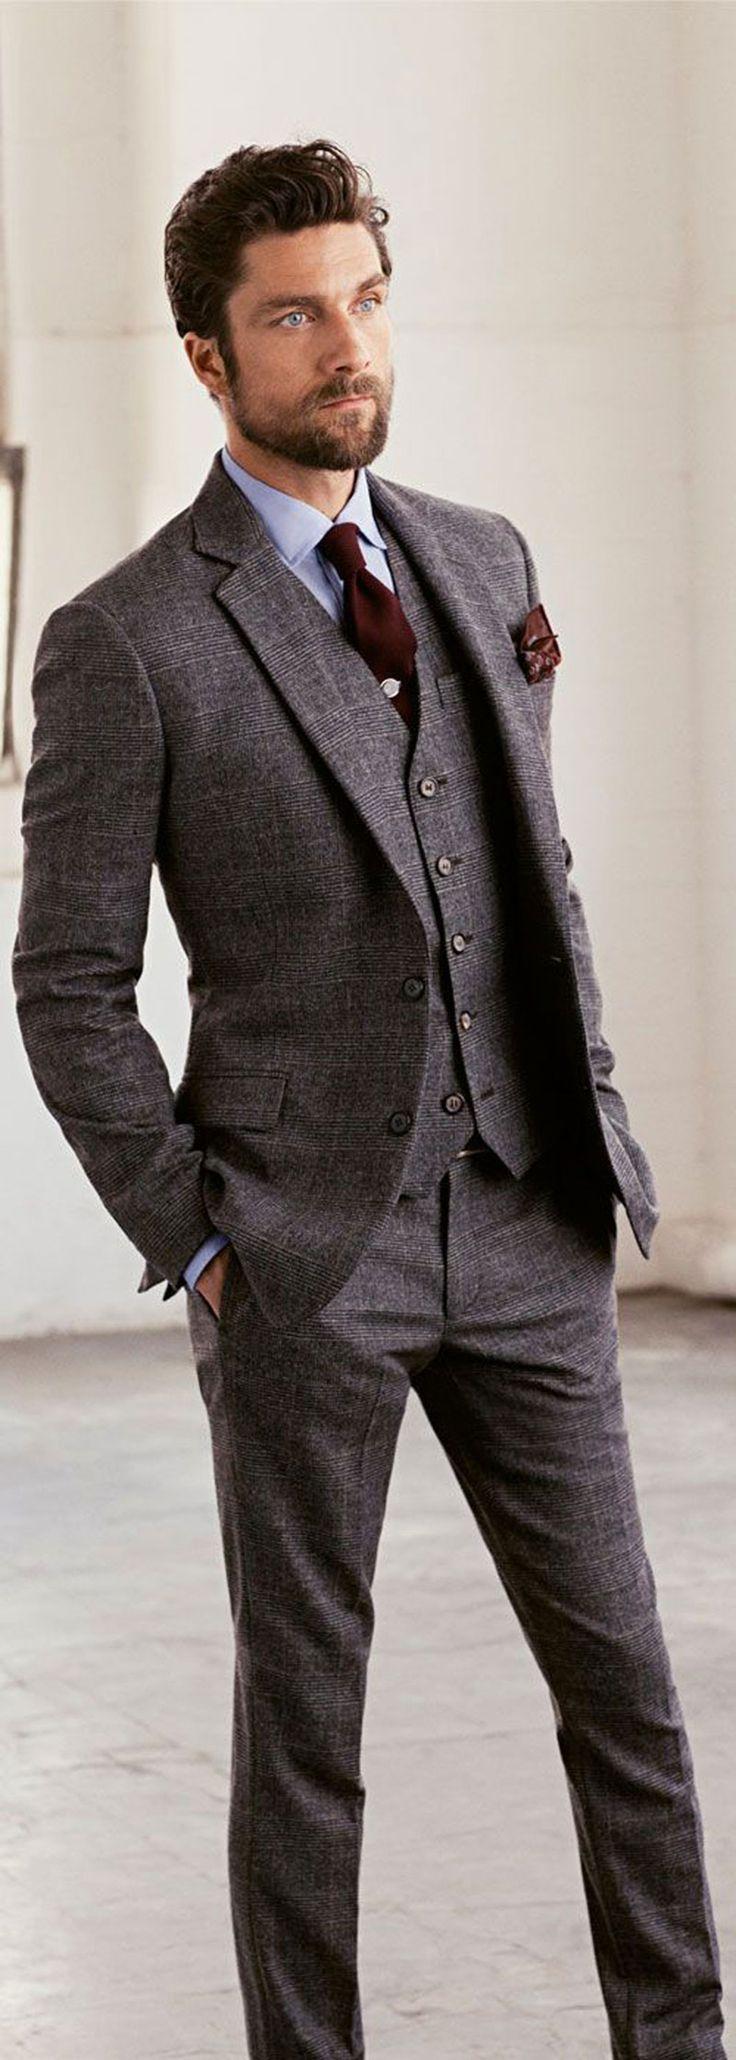 Grey Suit // fall wedding, groom, groomsmen, wedding party